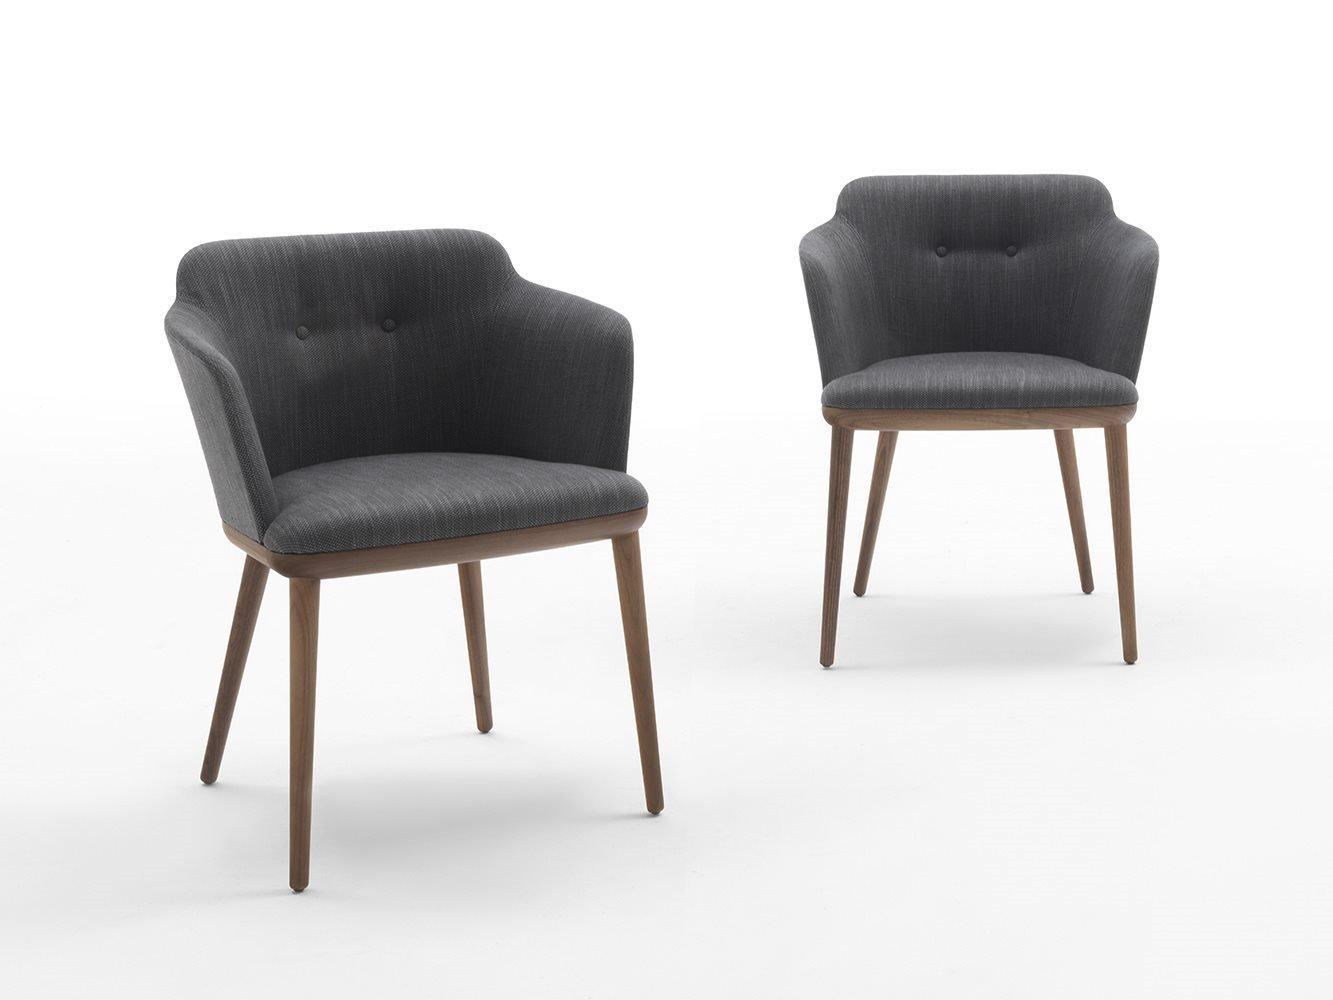 Celine Chair from Porada, designed by C. Ballabio